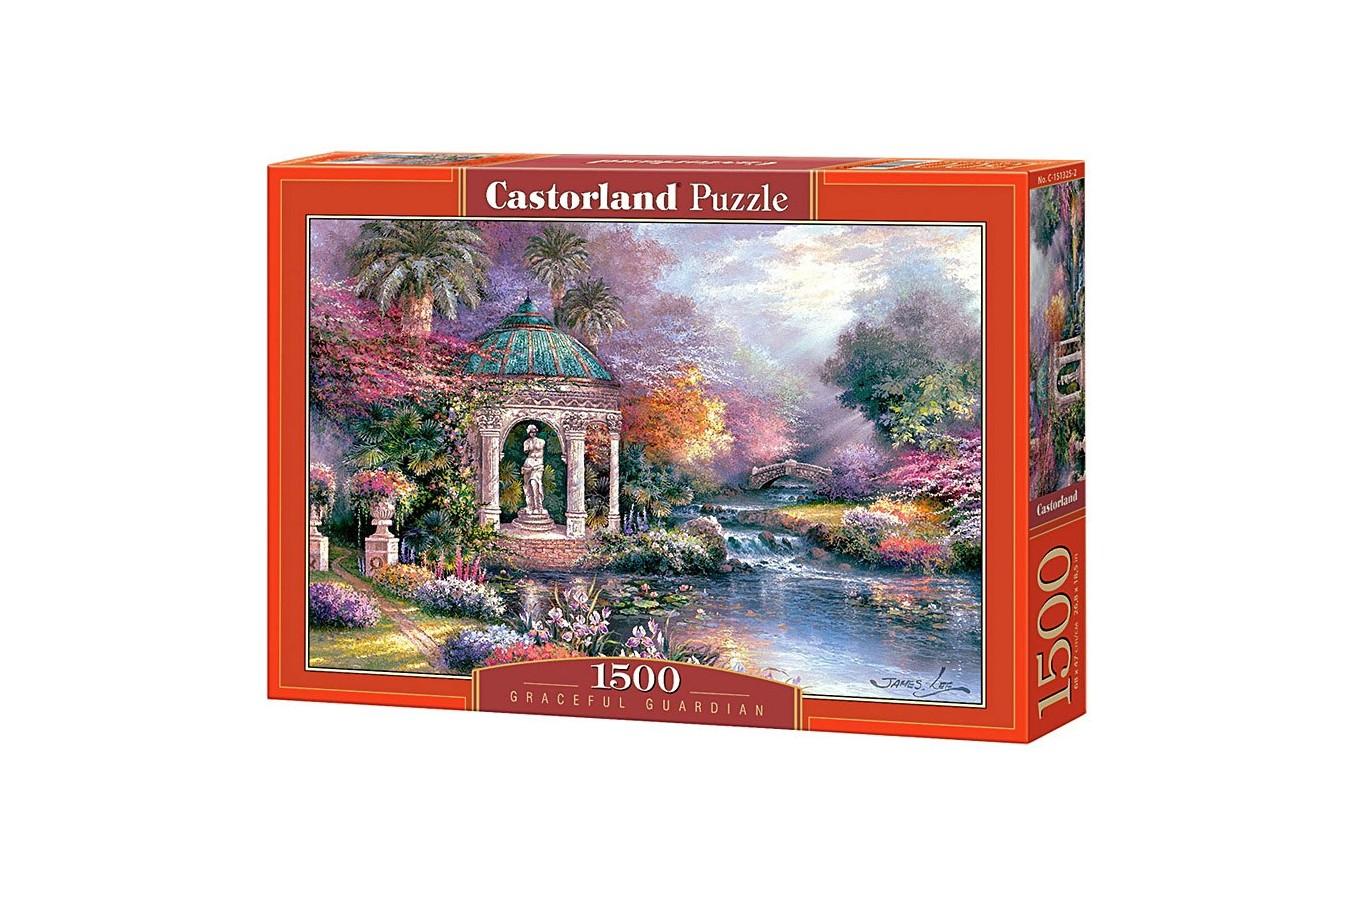 Puzzle Castorland - Graceful Guardian, 1500 piese